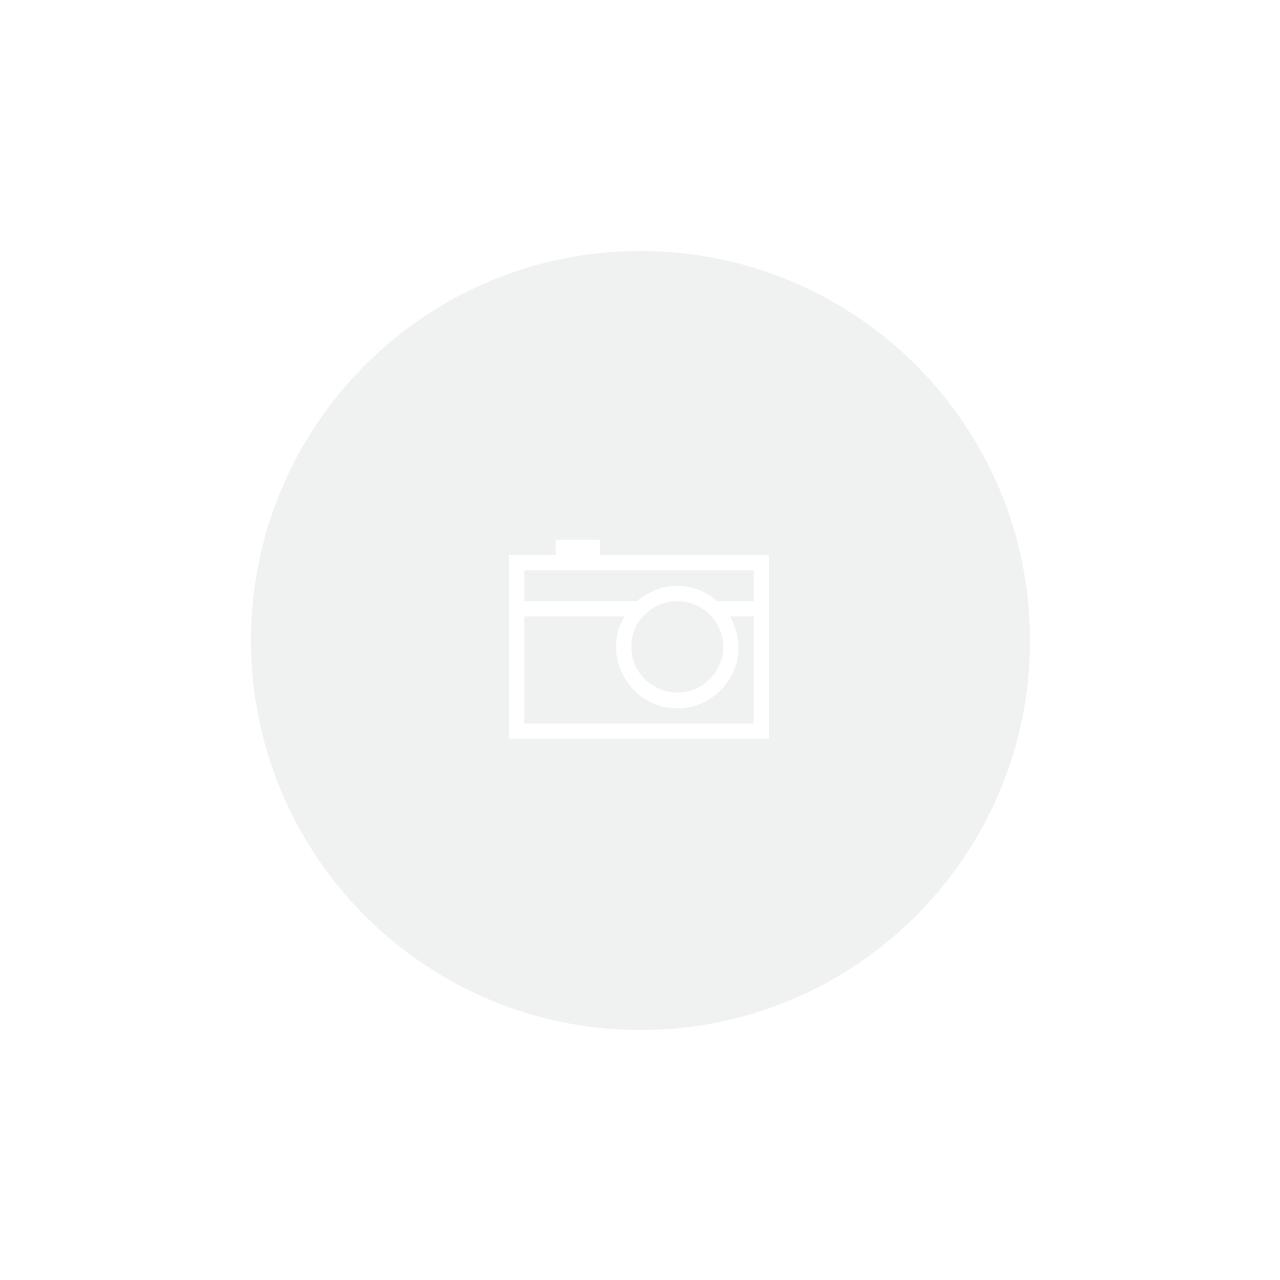 basica-canelada-c-renda-006if15